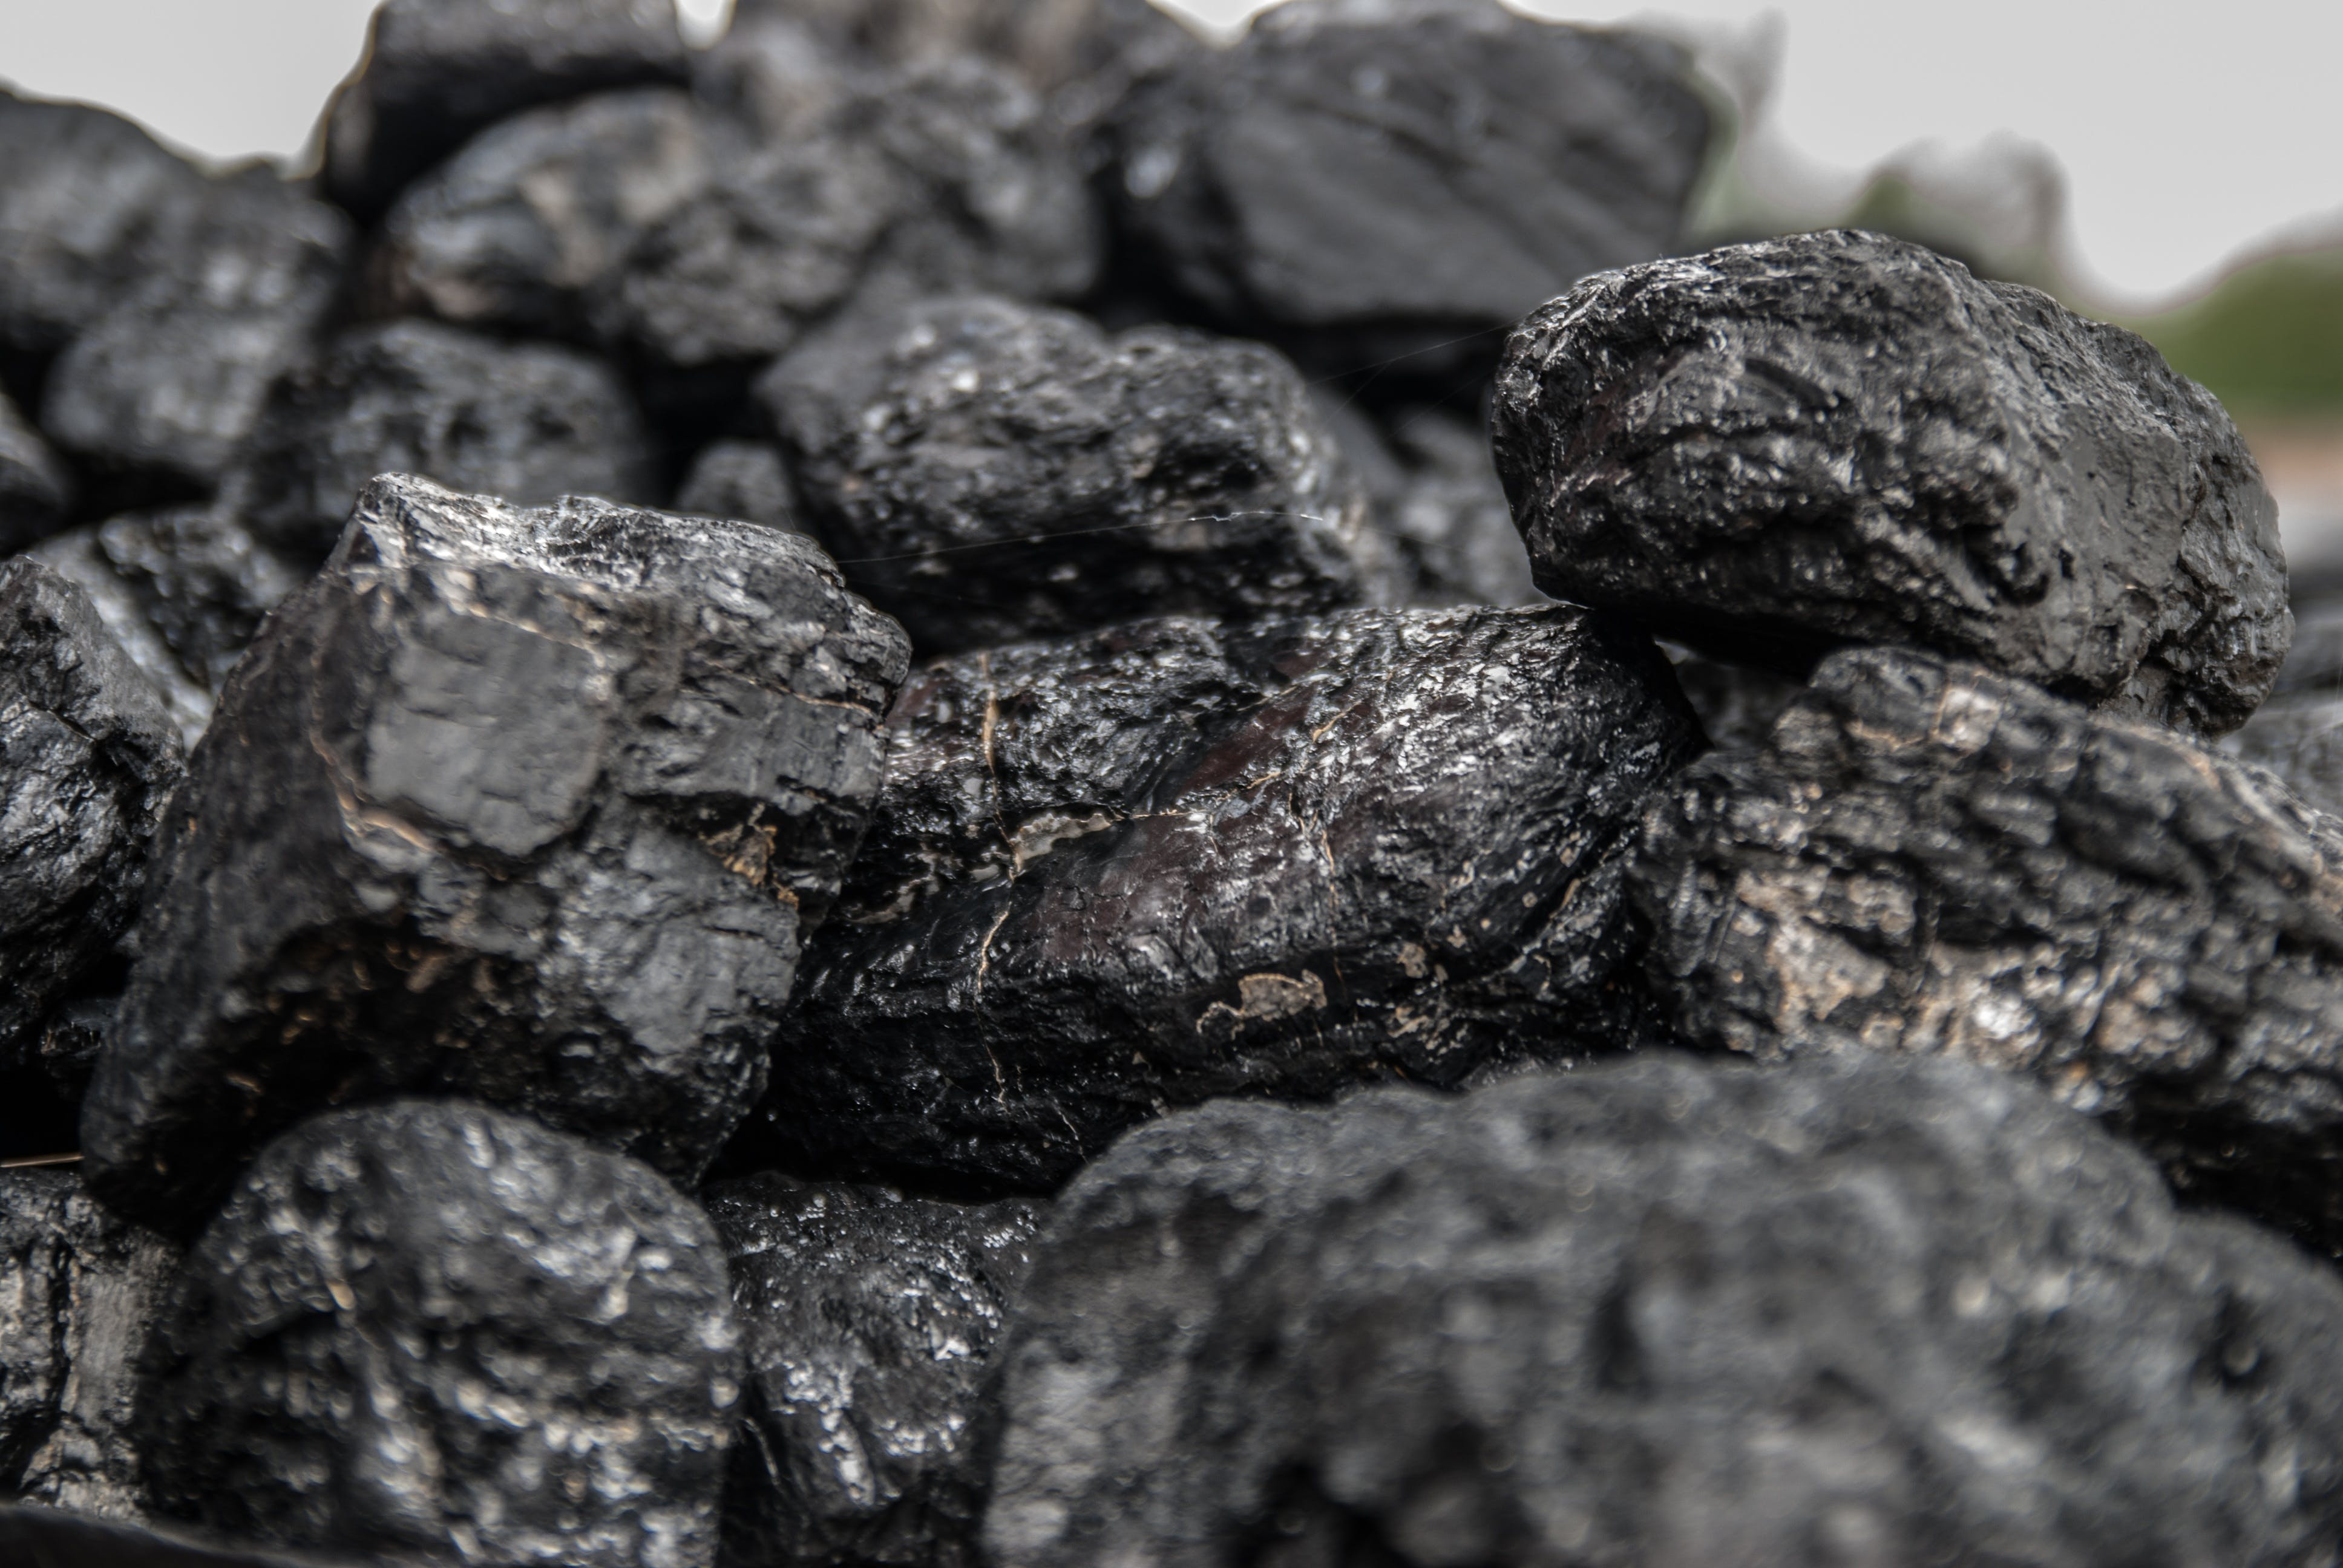 Close-up Photo of Black Stones